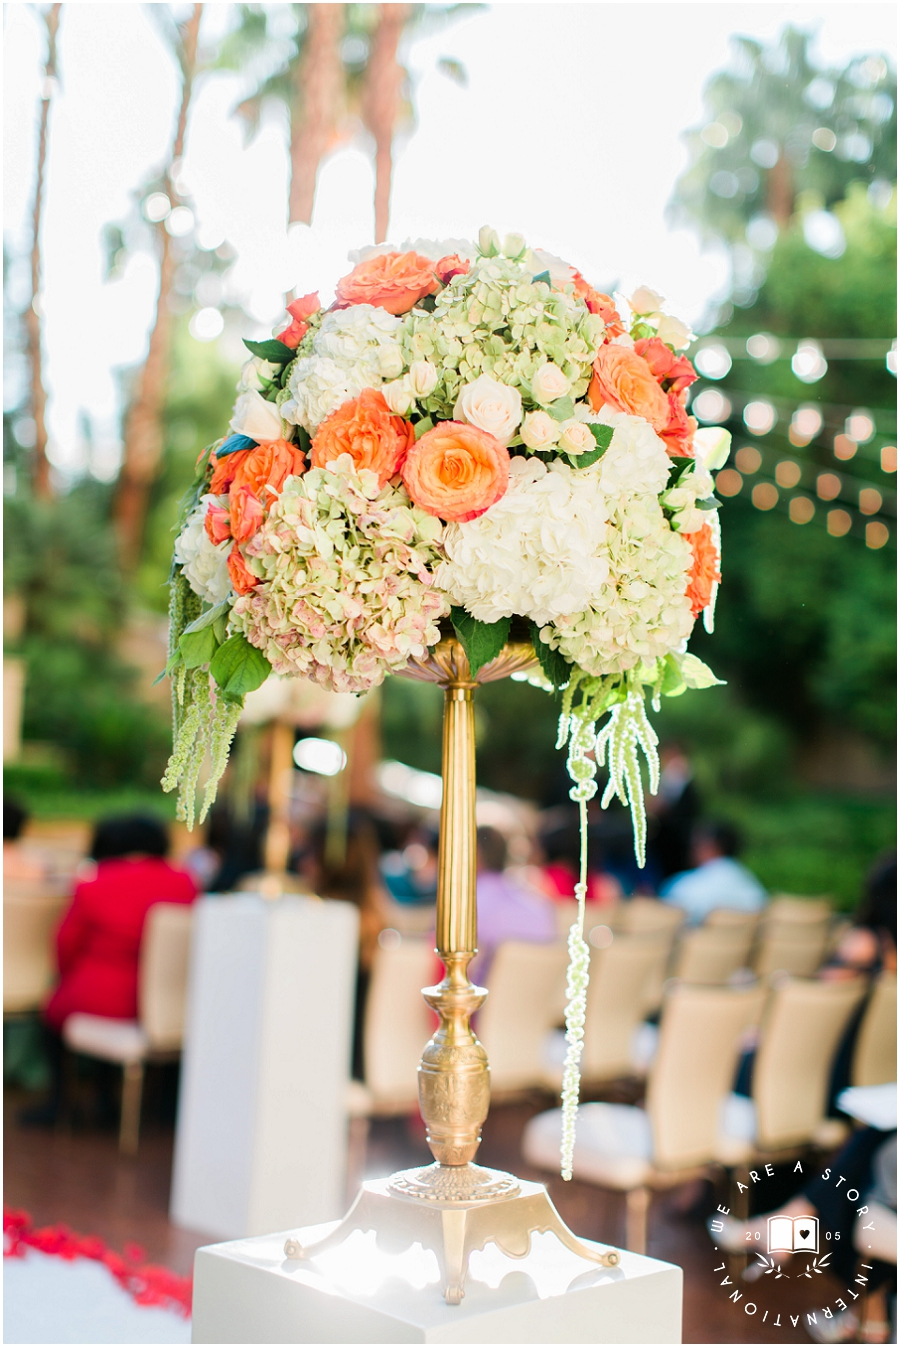 Four Seasons wedding photographer Las Vegas _ We Are A Story wedding photographer_2484.jpg